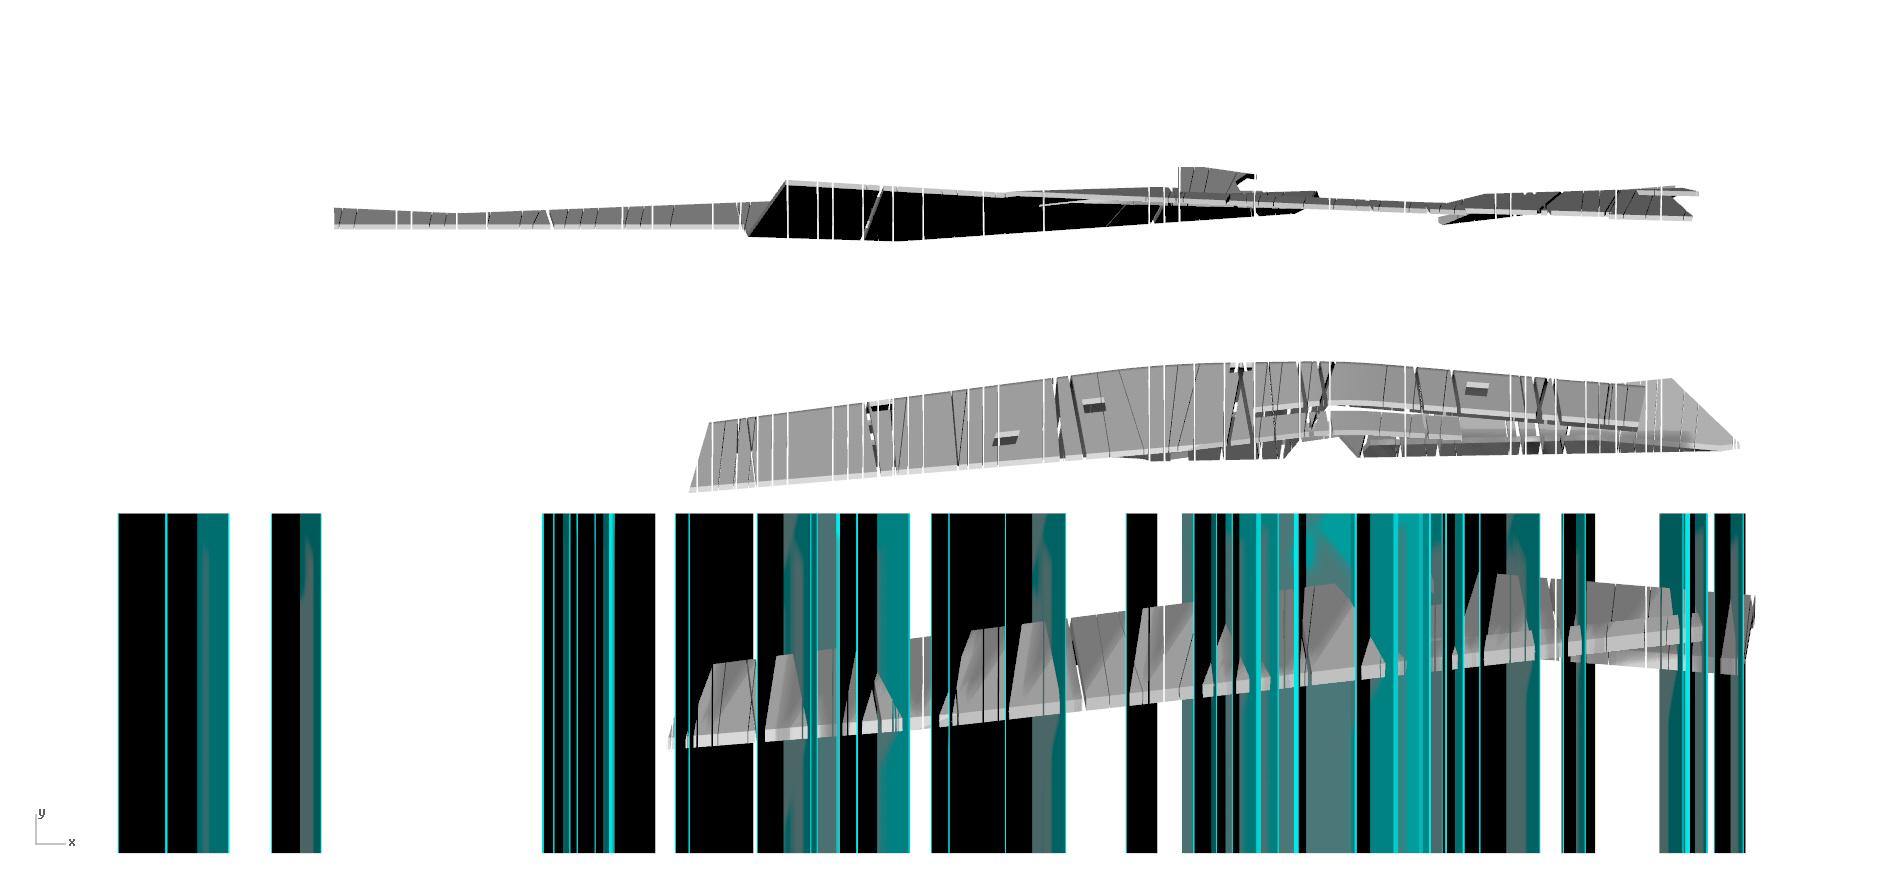 BANDS 01_PLAN DIAG-D